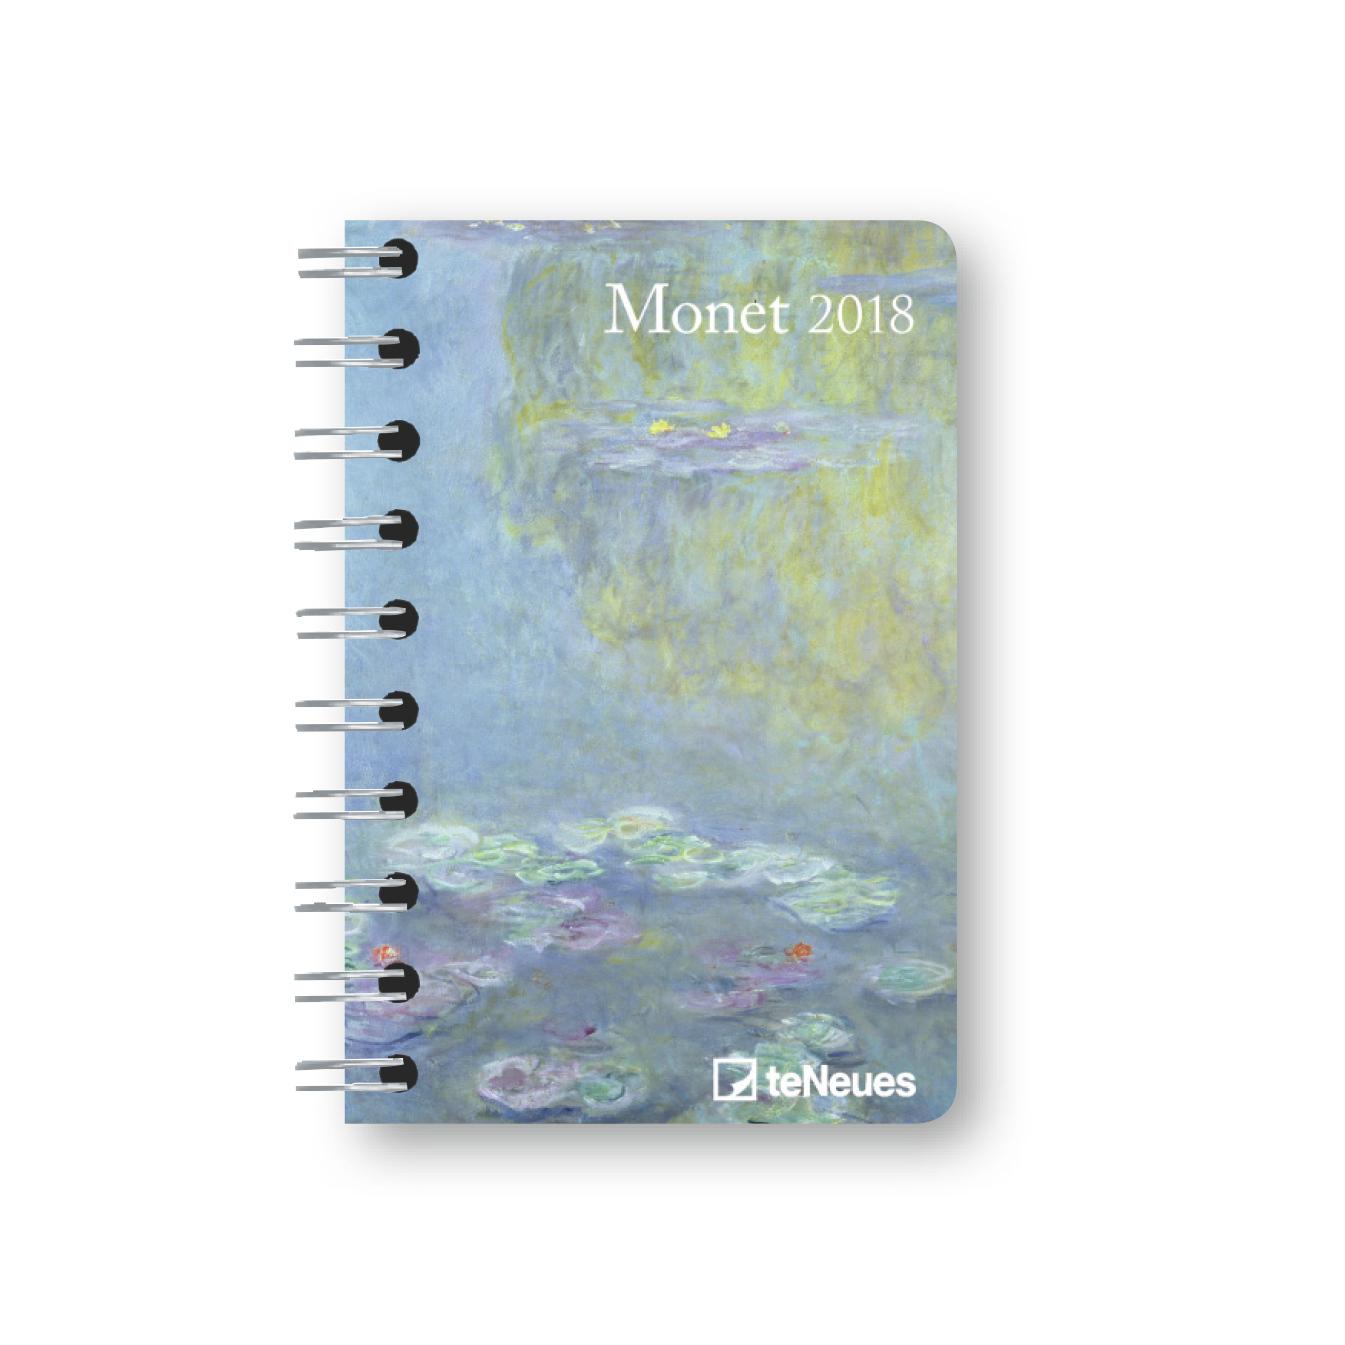 monet pocket diary 2018 von monet claude buchkalender. Black Bedroom Furniture Sets. Home Design Ideas